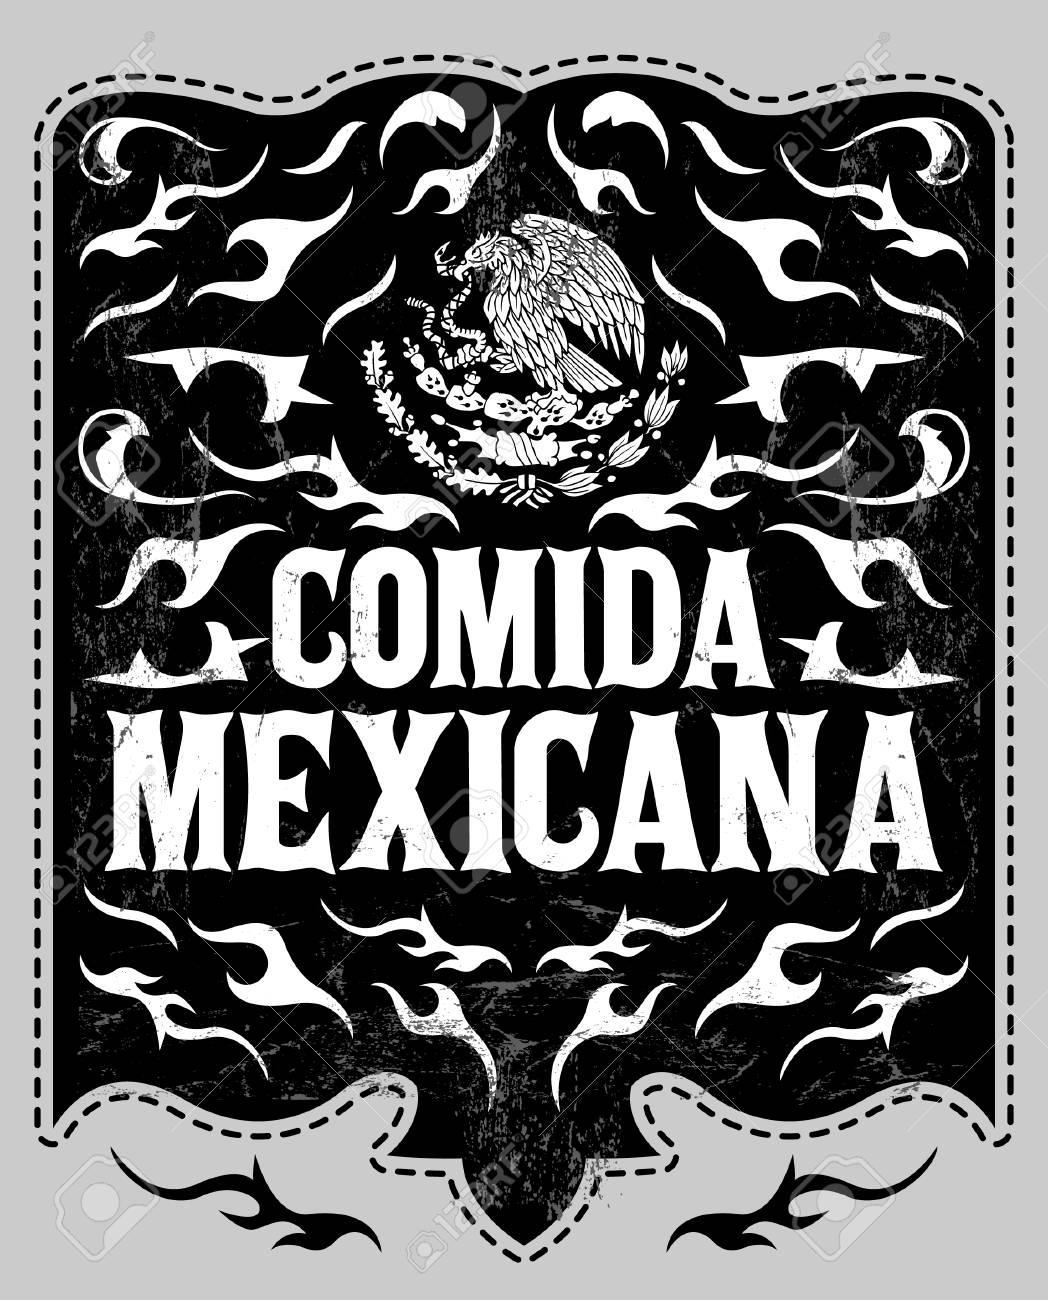 comida mexicana - mexican food spanish text - vintage restaurant